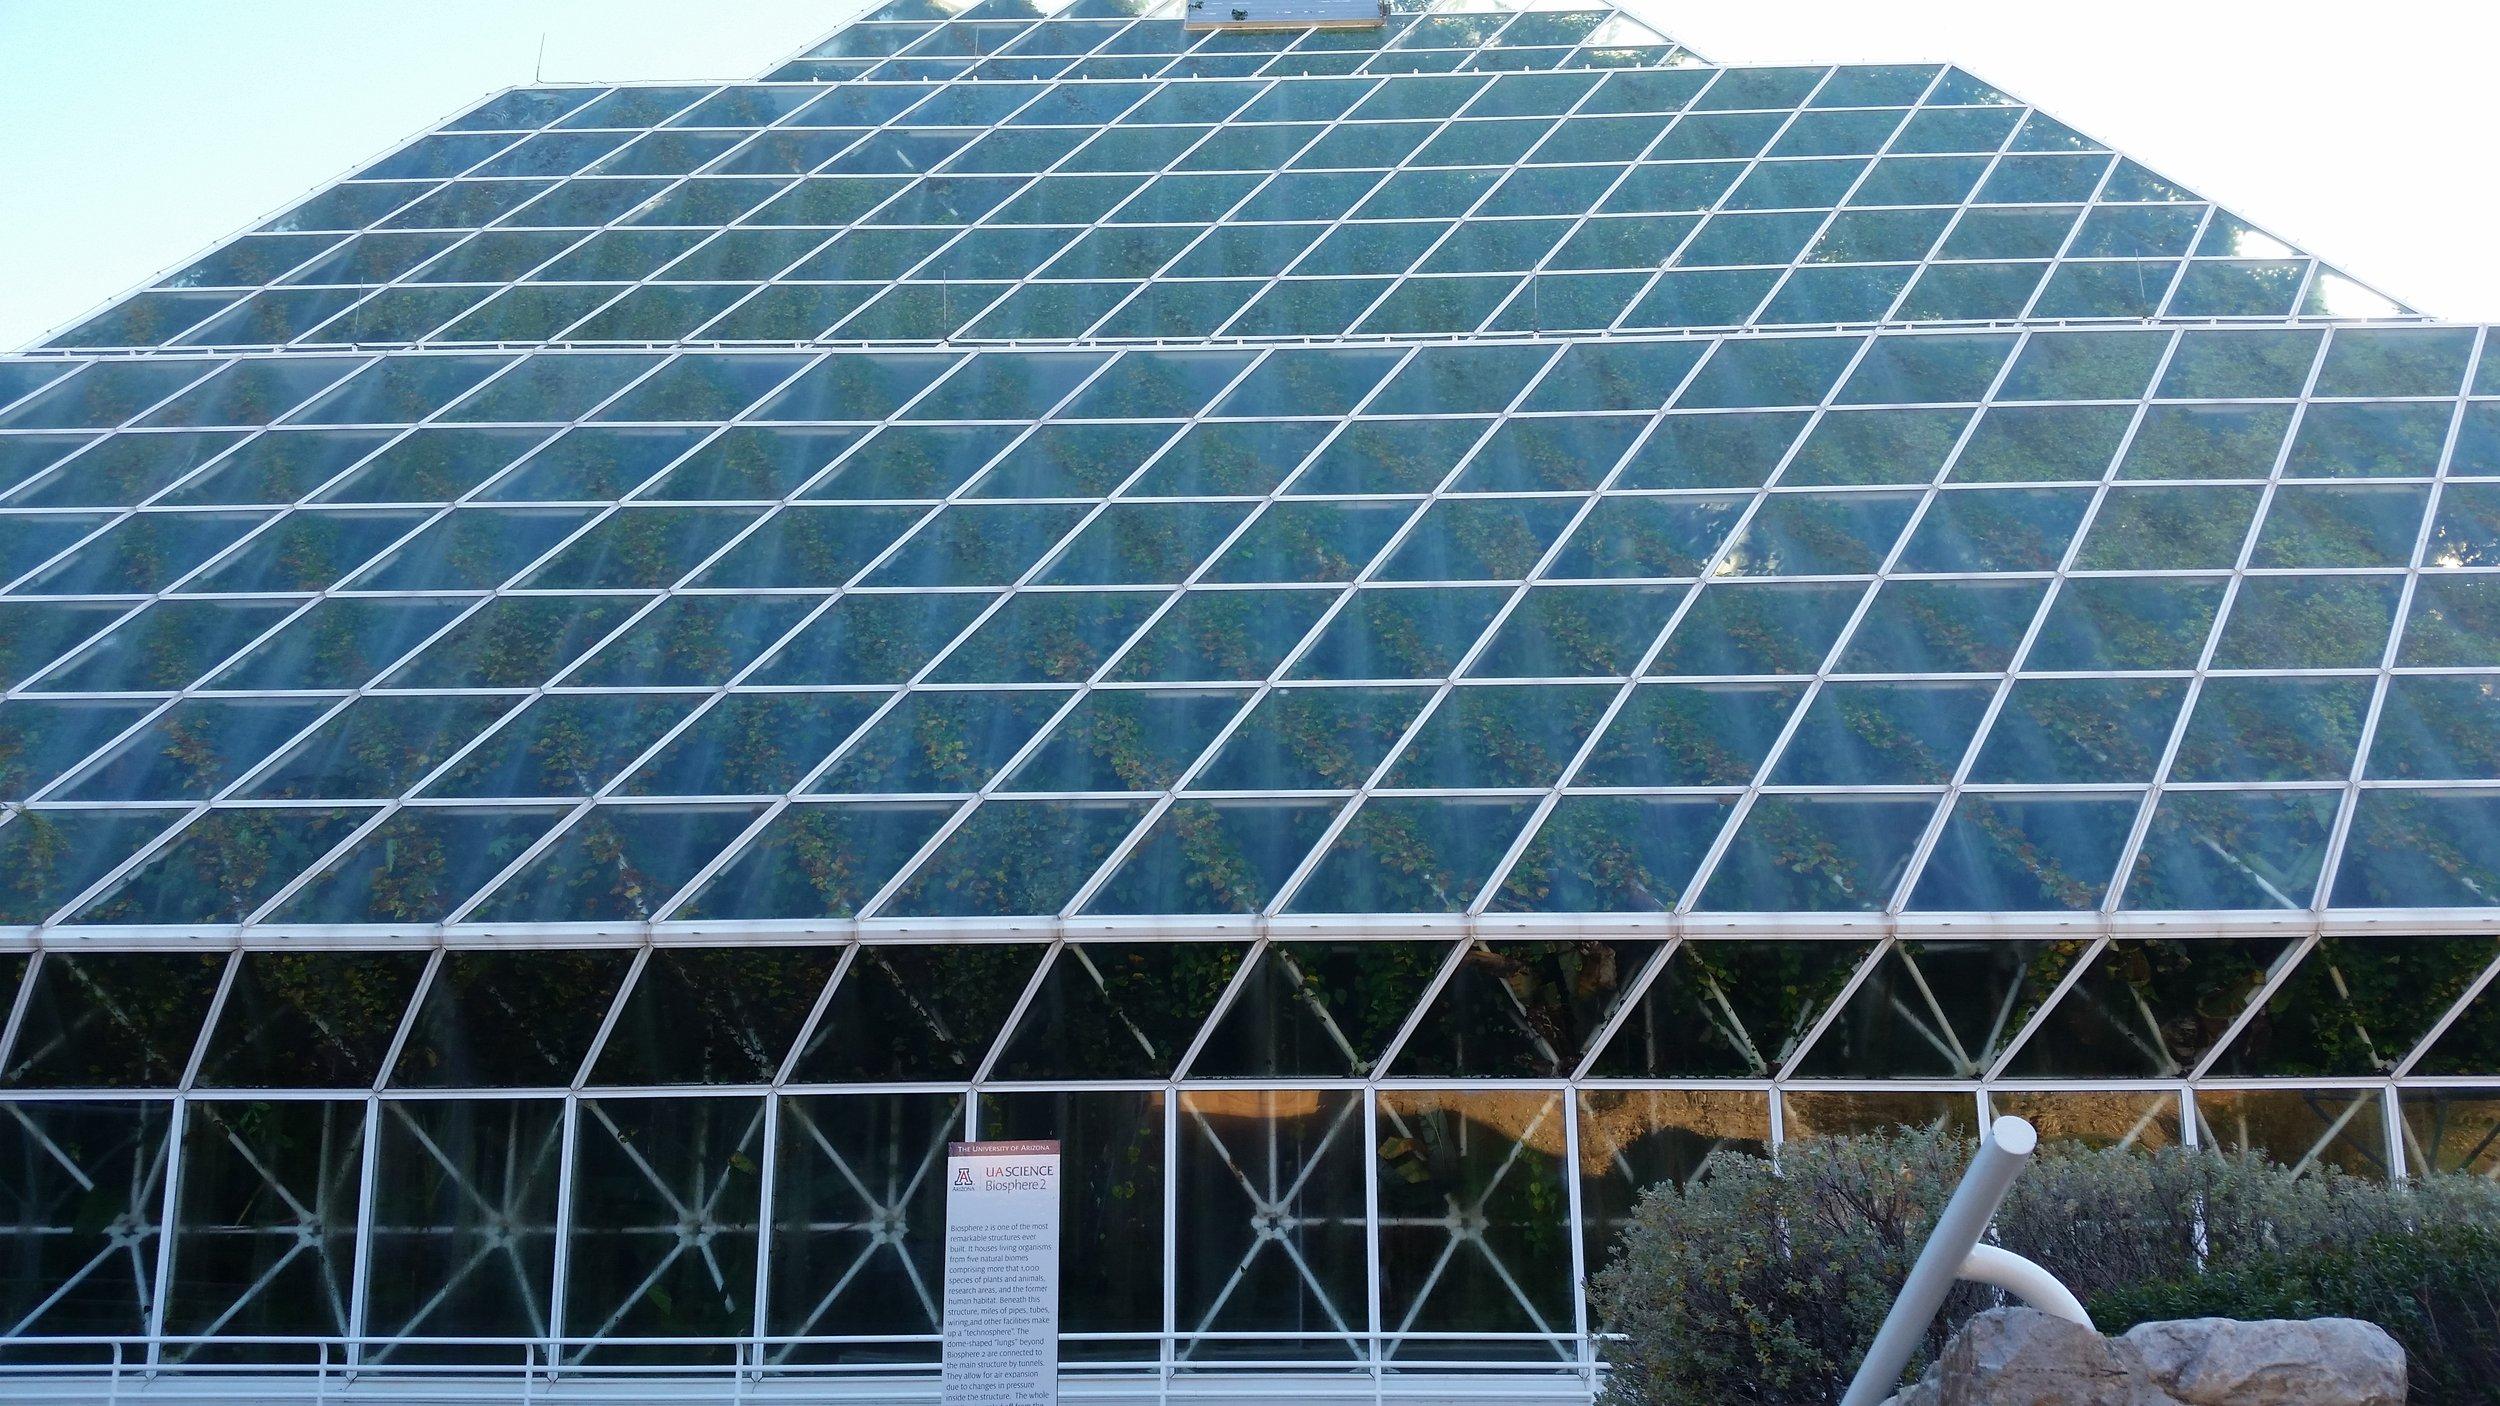 Biosphere 2, Arizona U.S.A.